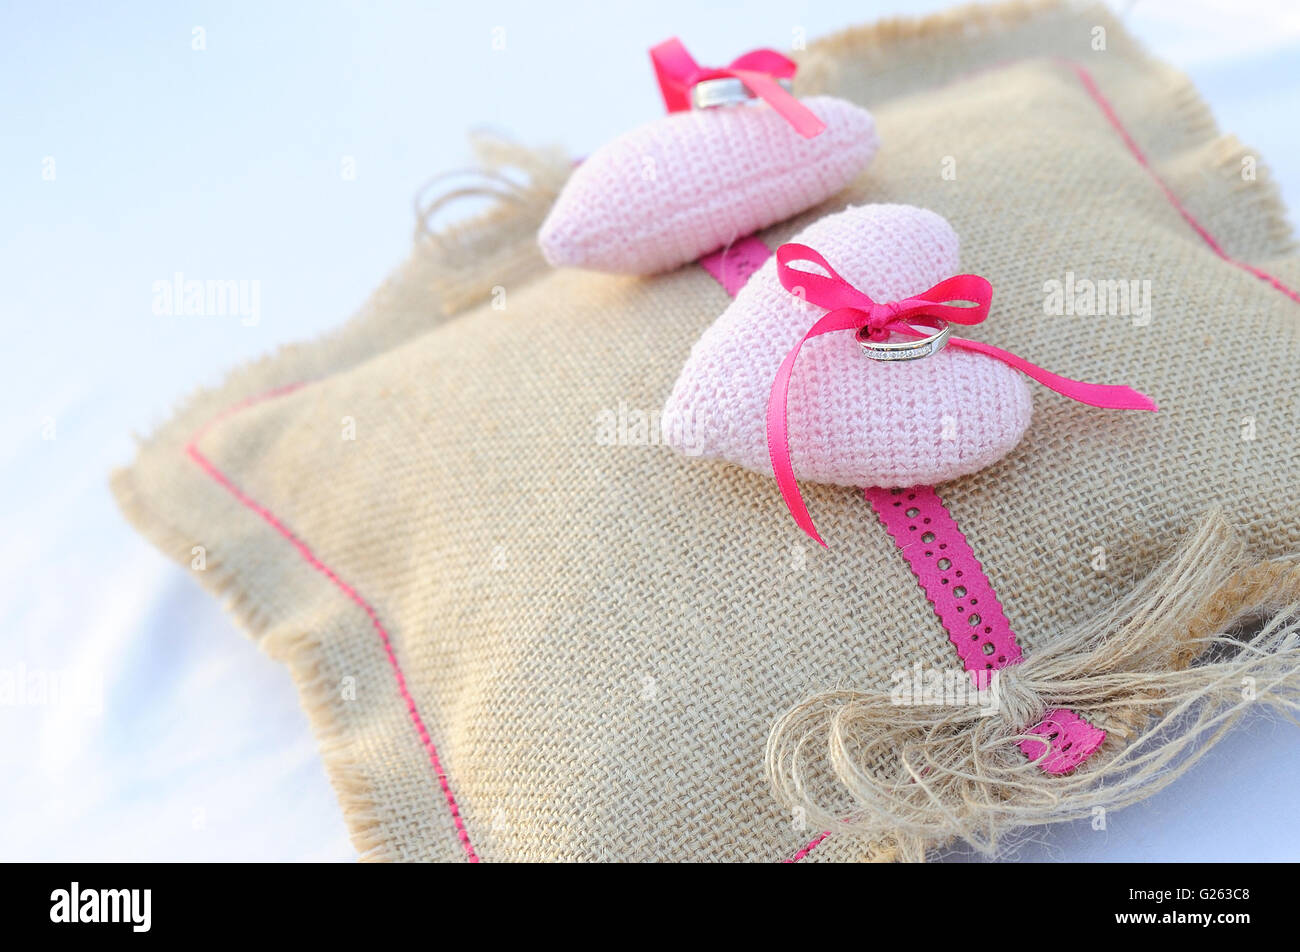 Anillos de compromiso sobre Arpillera almohada con dos corazones de color rosa Imagen De Stock